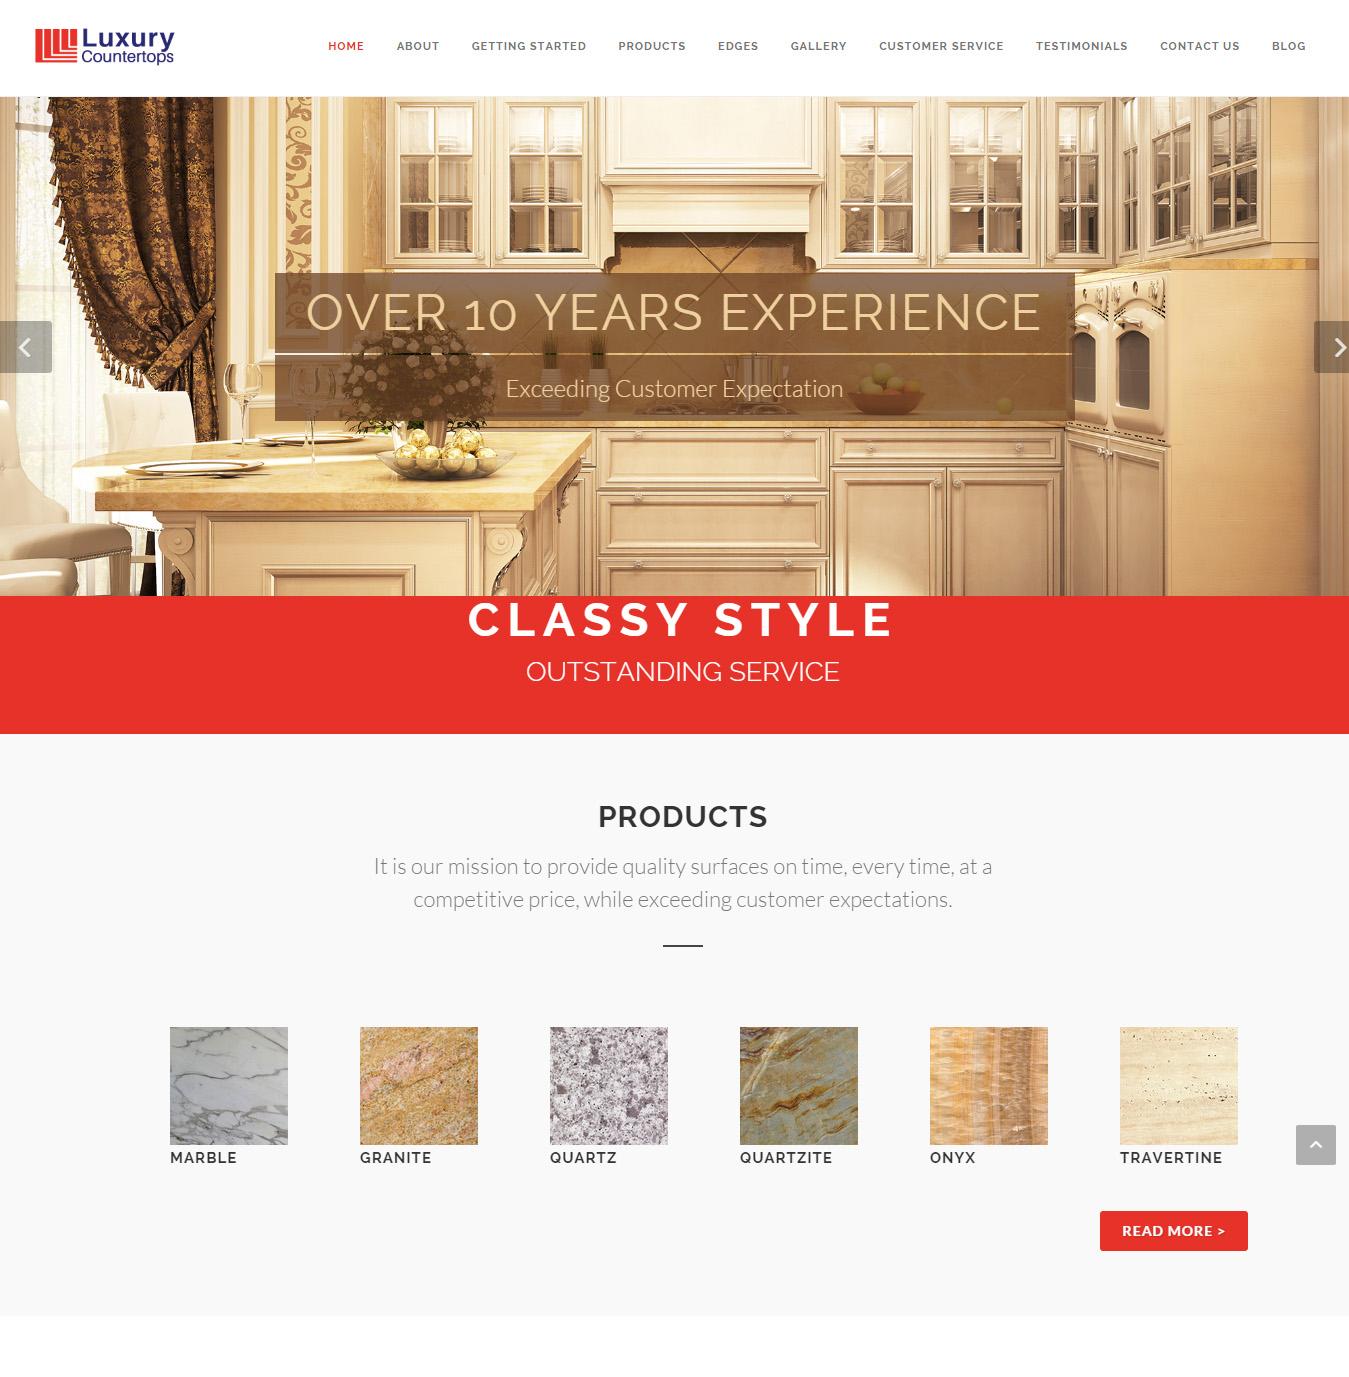 Luxury Countertops screenshot